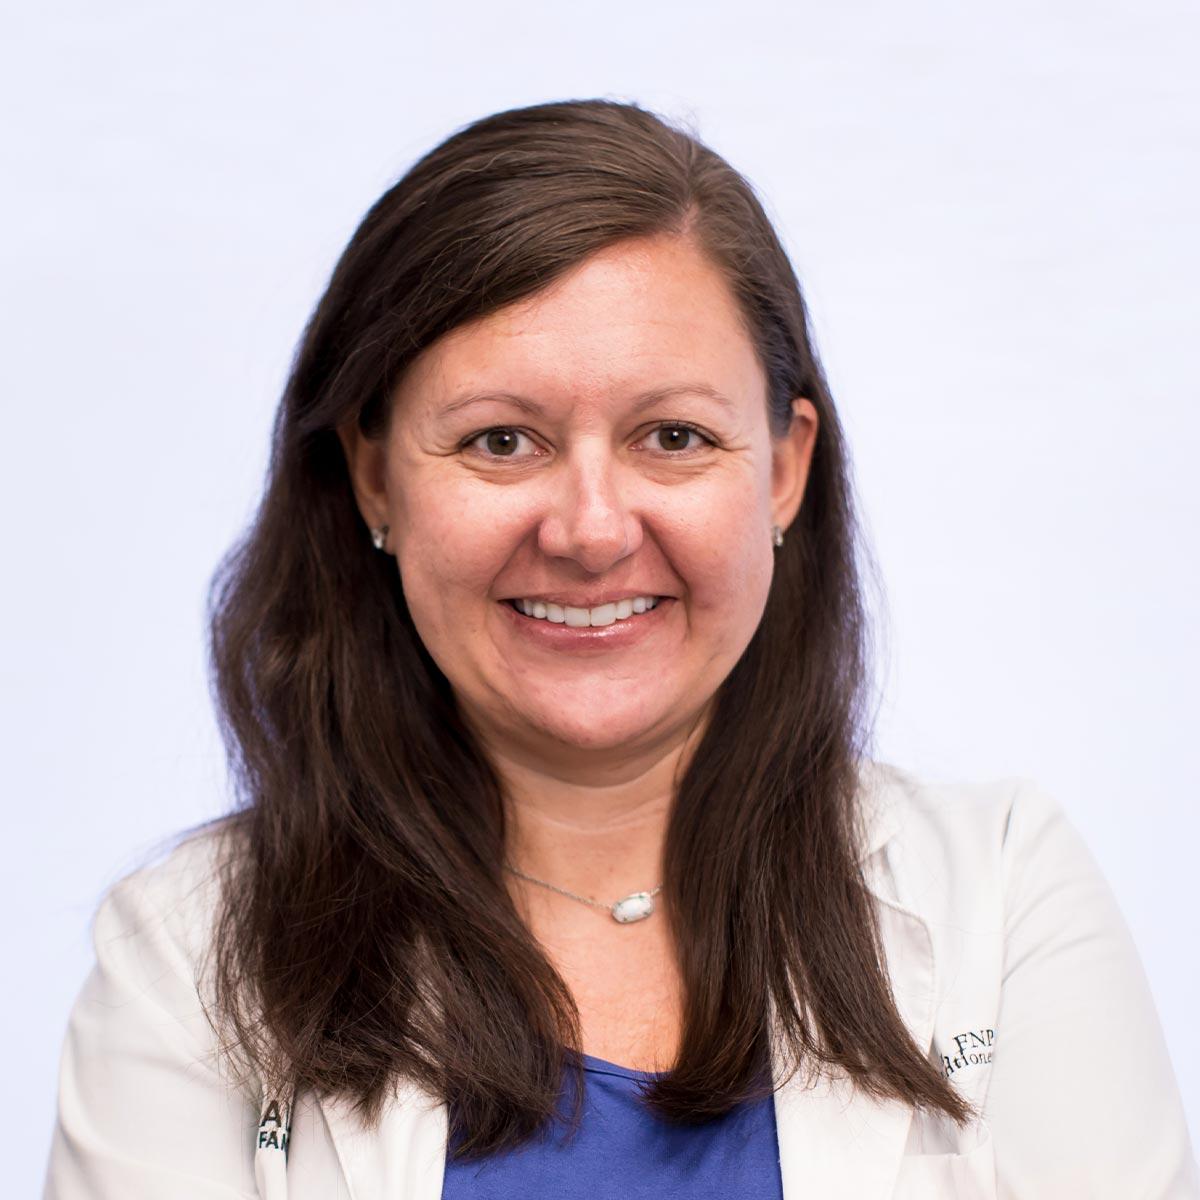 Allison Taylor, FNP-BC